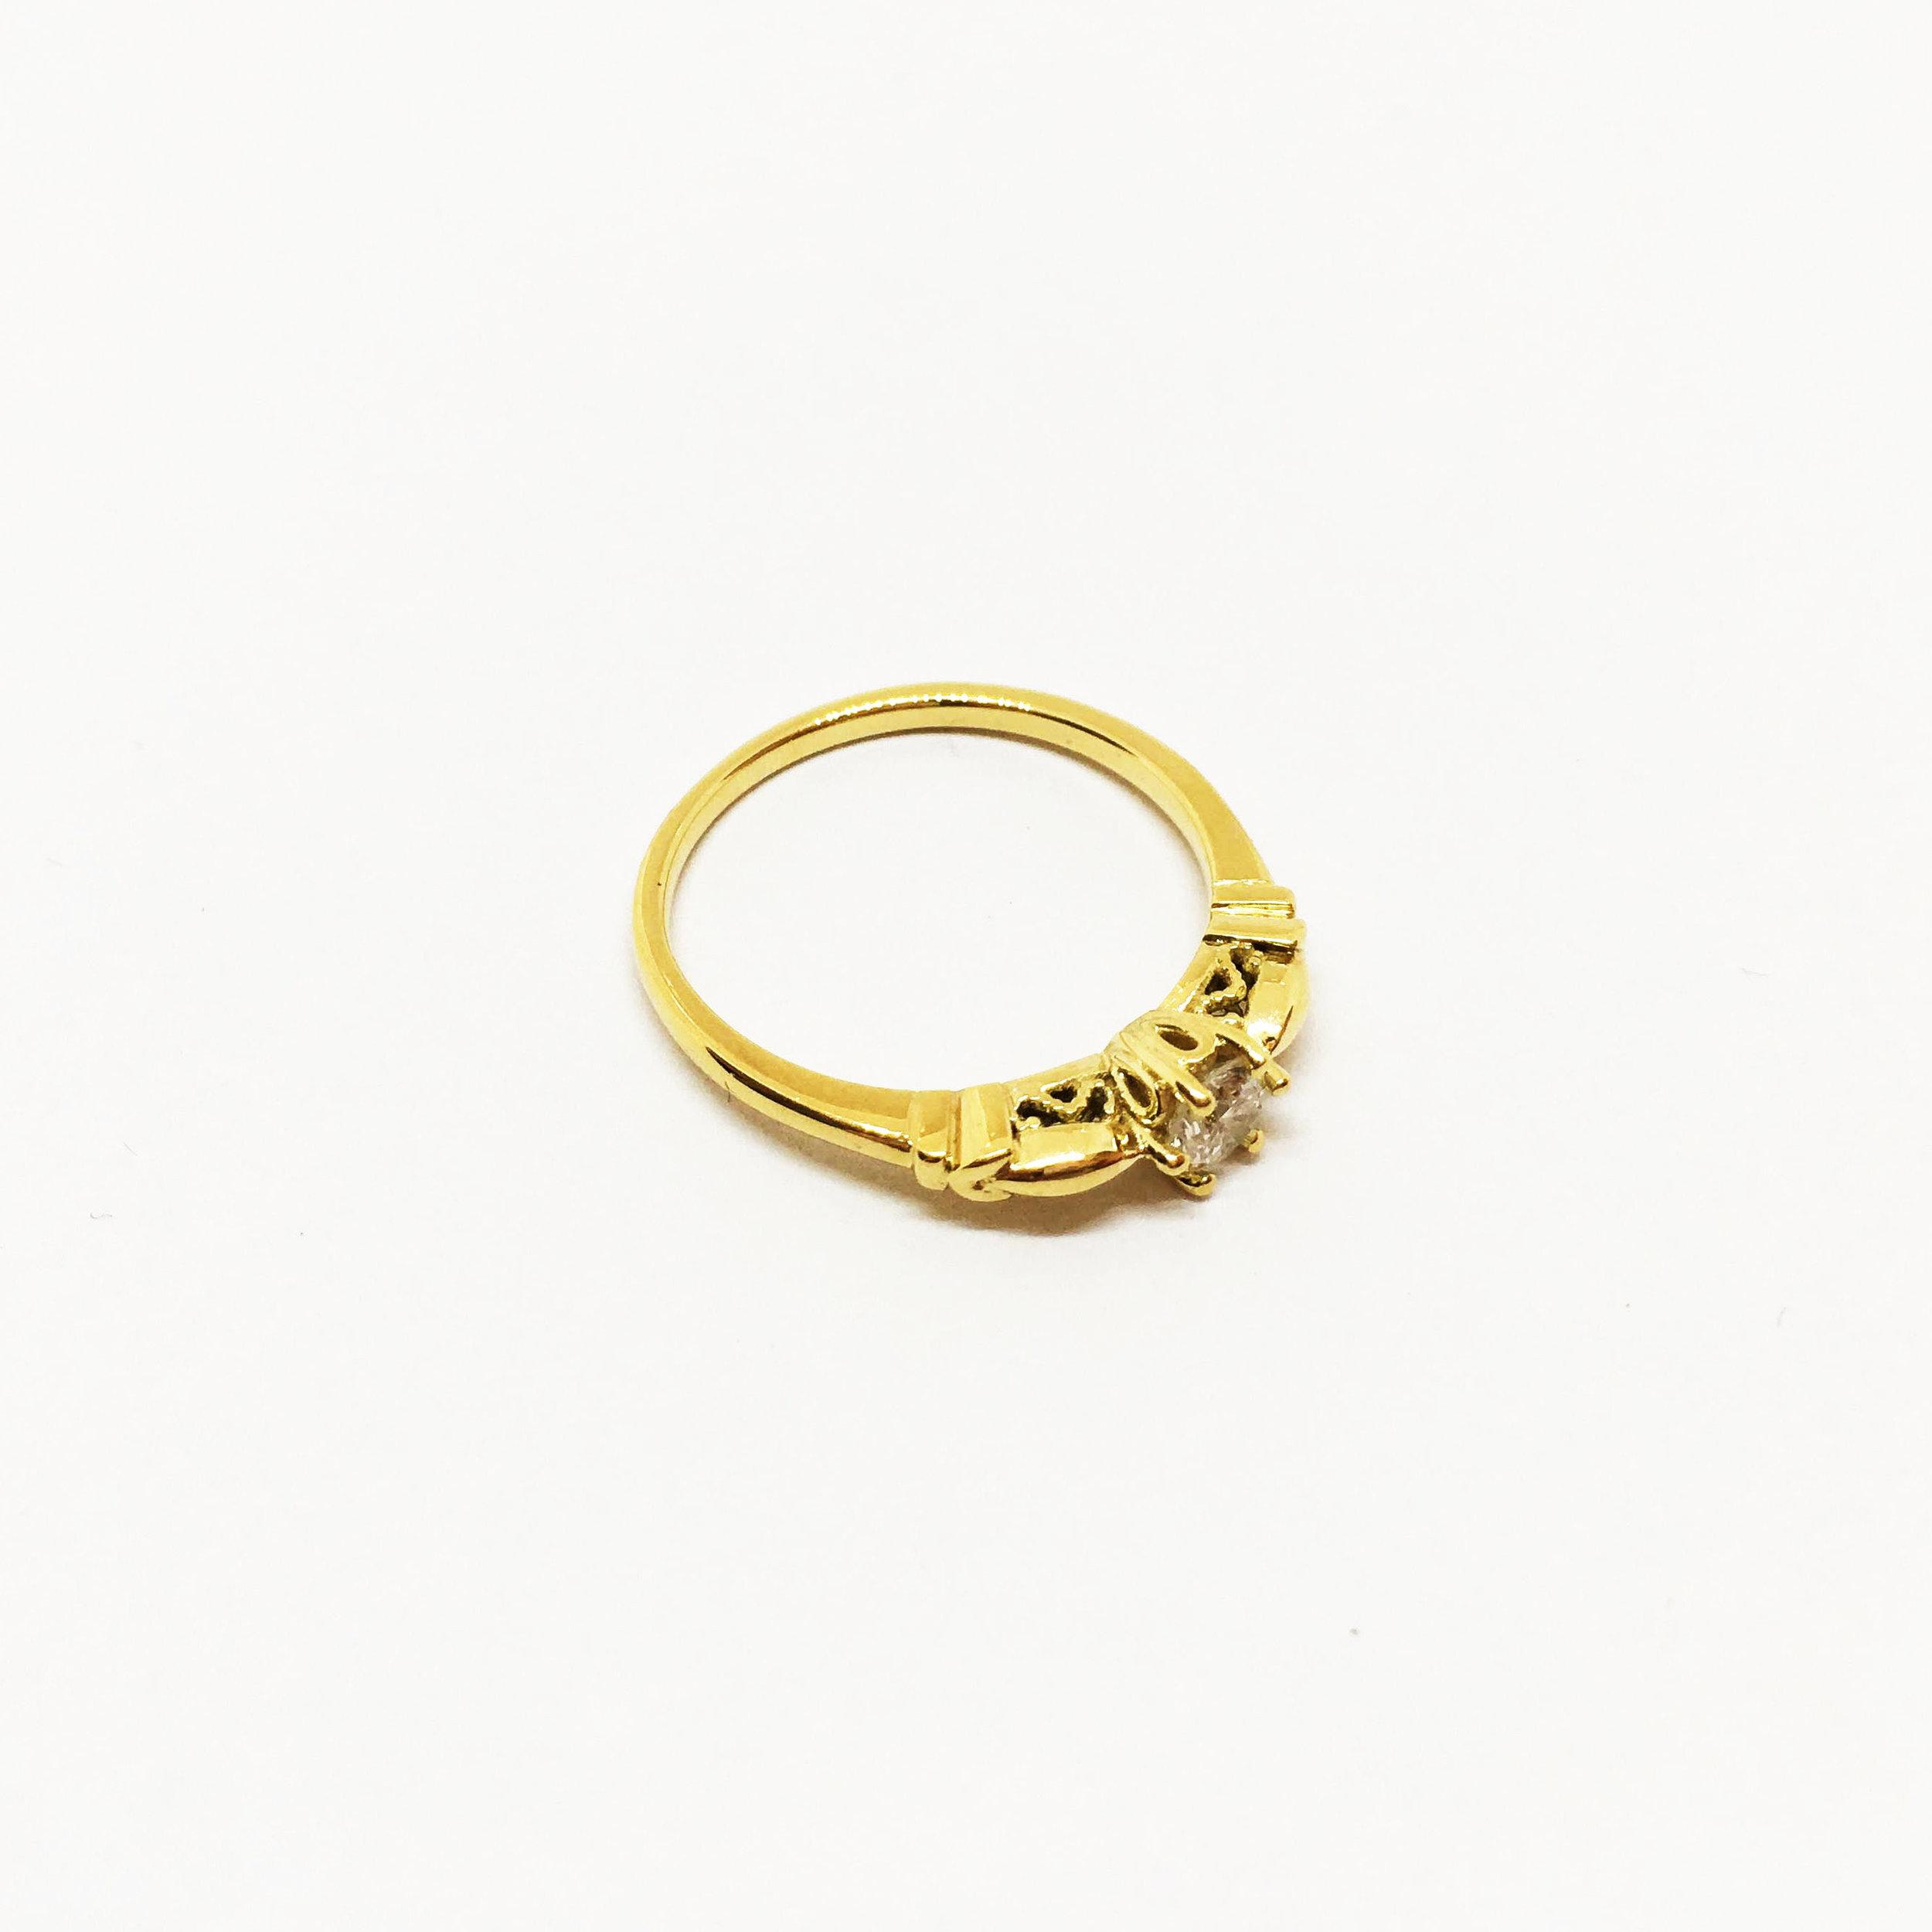 18ct Yellow Gold Heirloom Ring Detail 2_Kolmio.jpg